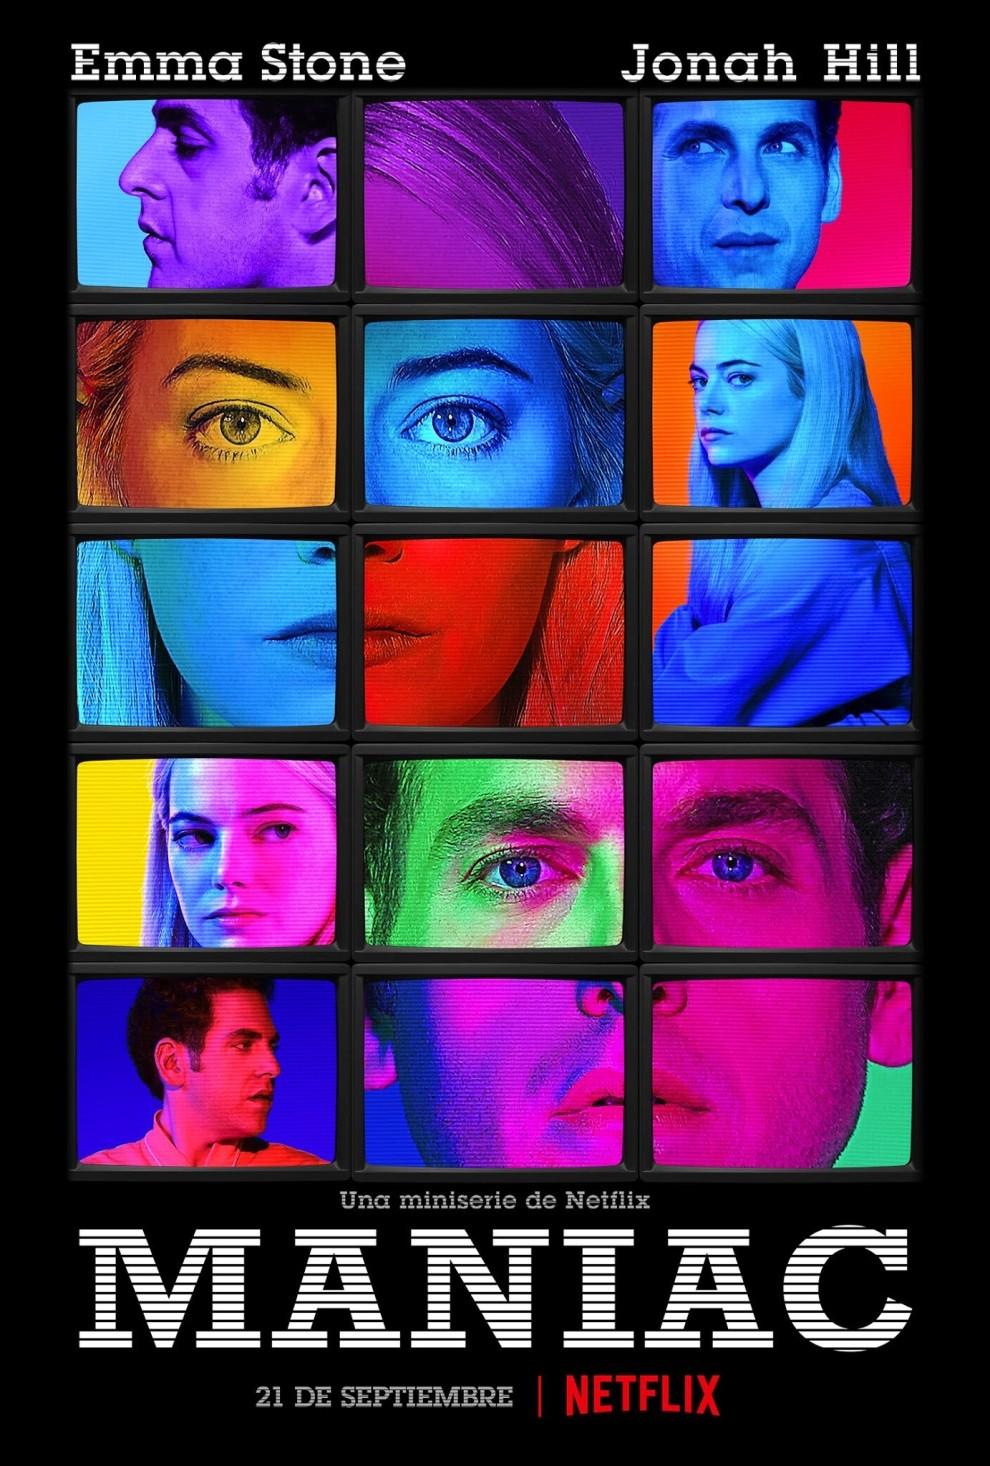 Poster de Maniac la nueva serie de Netflix